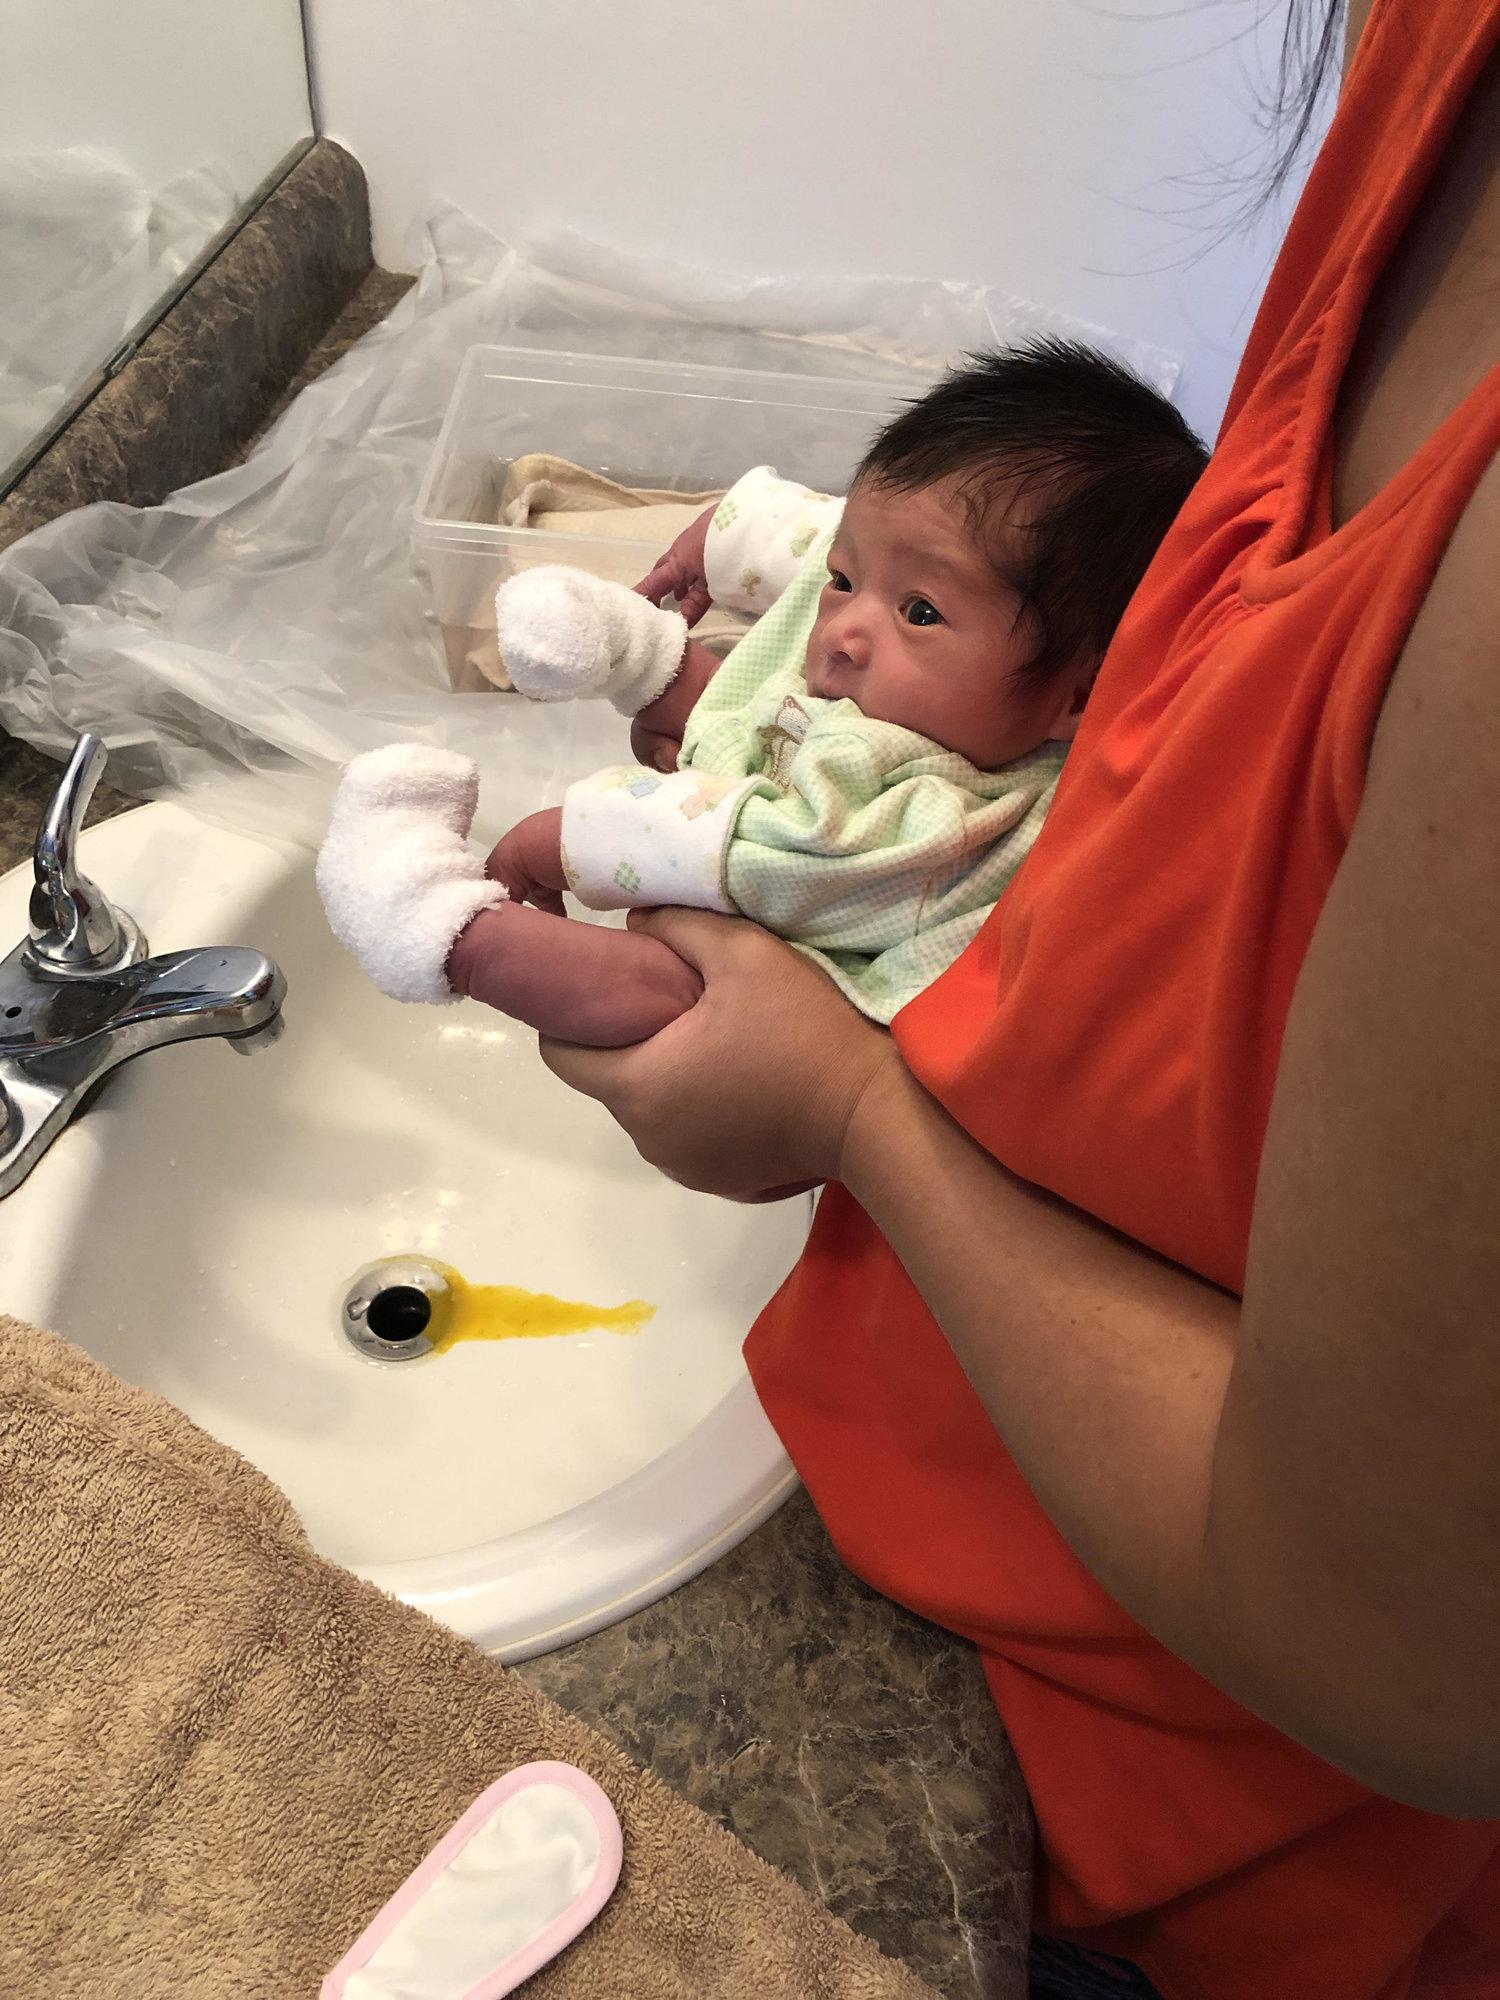 2c40ea5fc5e Elimination Communication With a Newborn (First 2 Weeks) — Komfi Baby